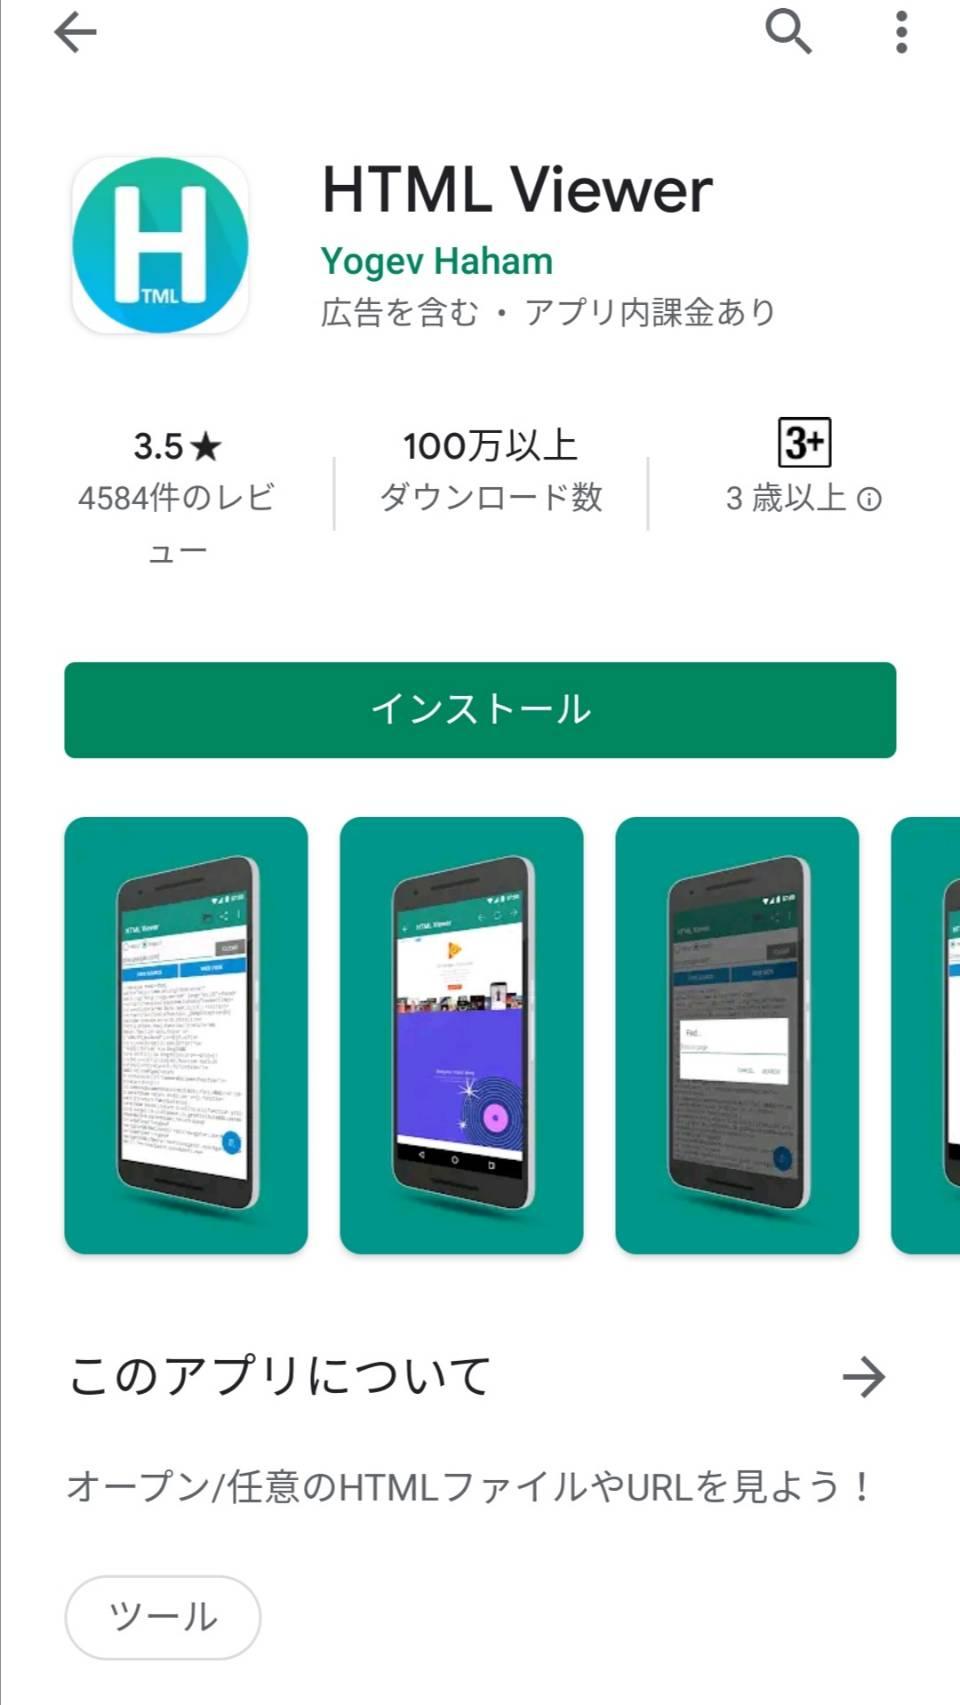 HTML Viewer(青)